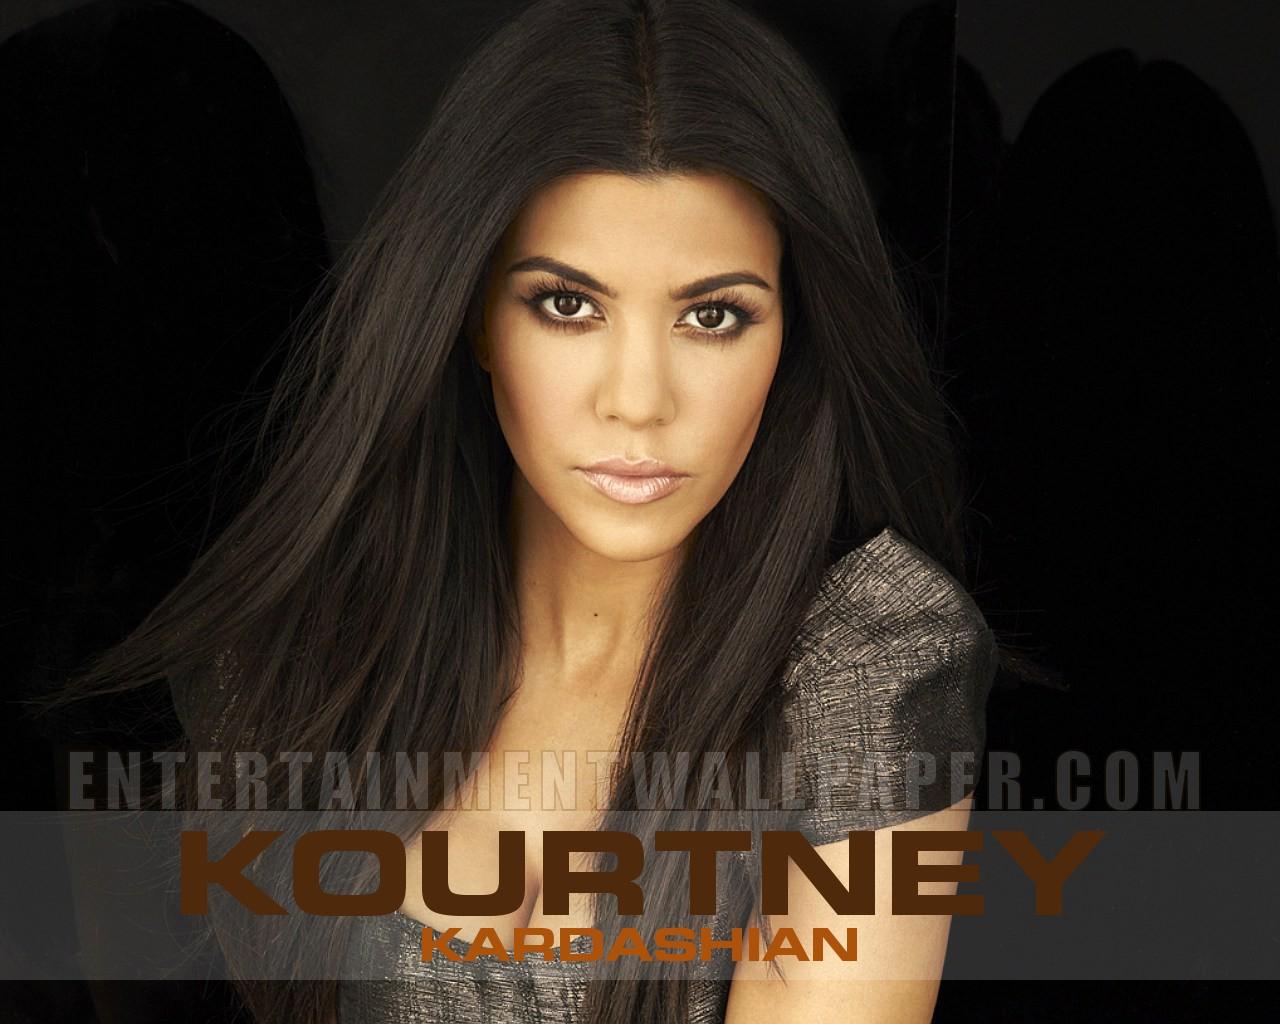 Kourtney Kardashian Pictures 5 HD Wallpapers